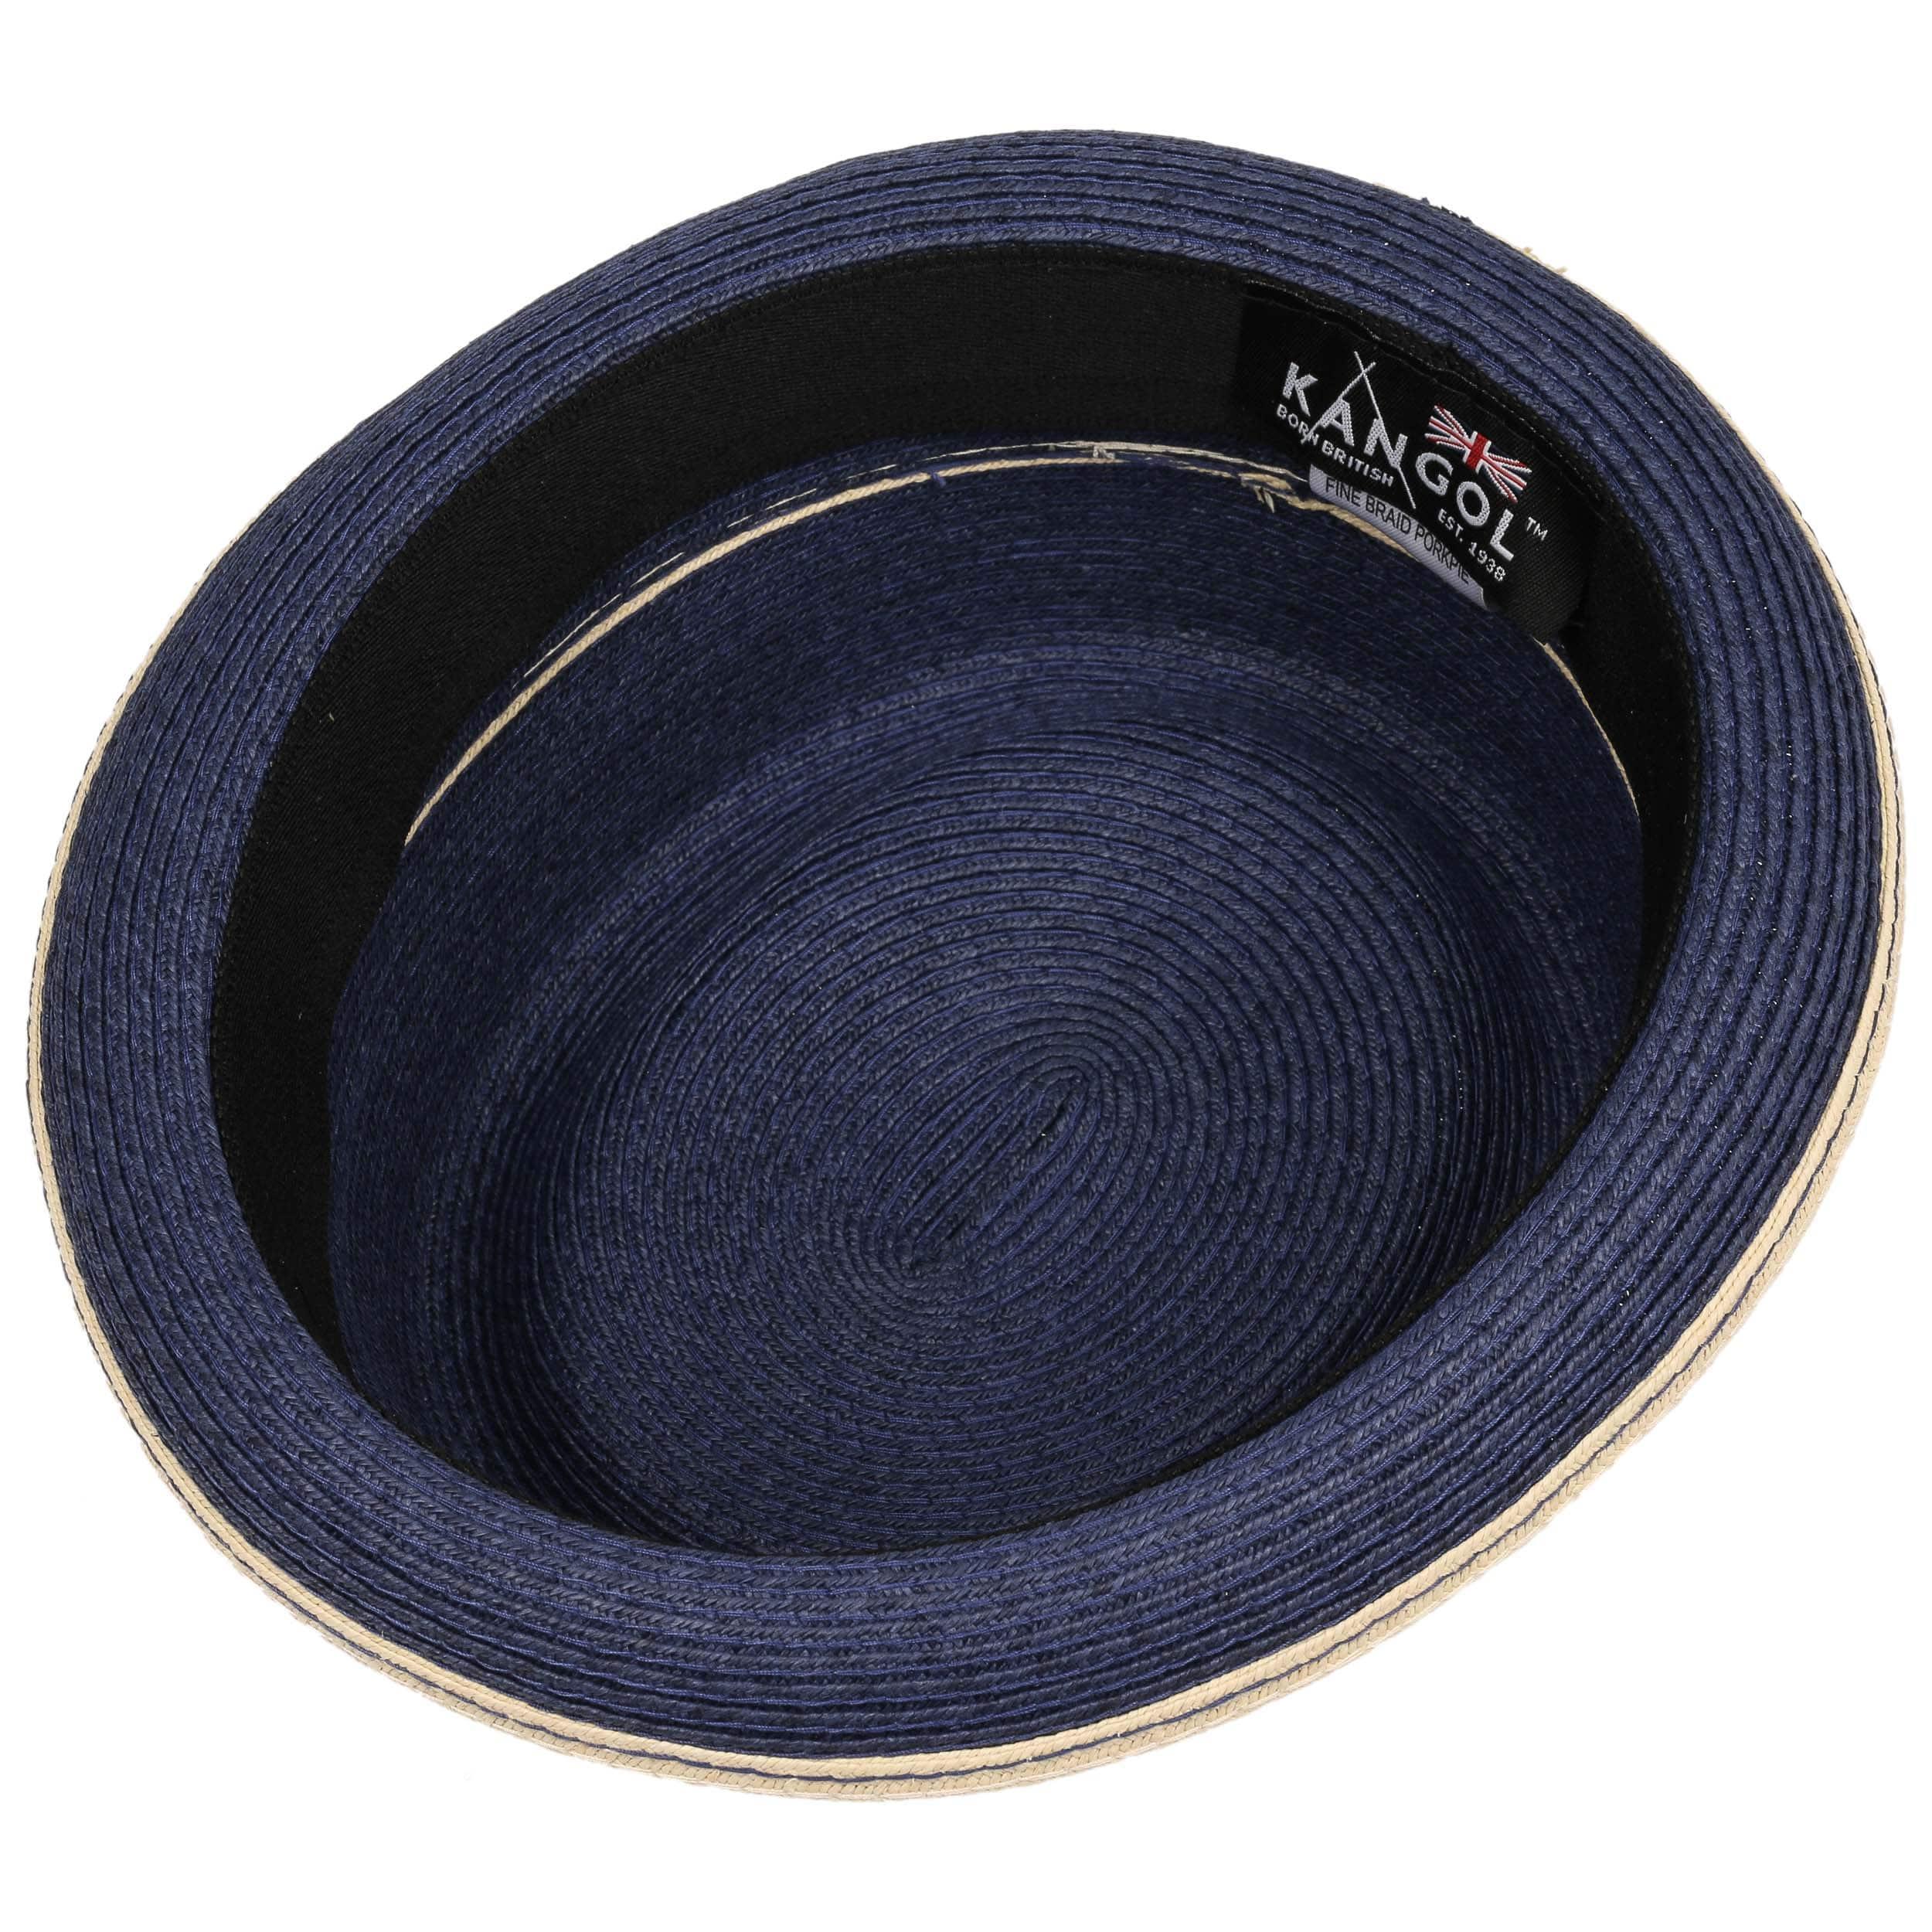 93c3f1d9e4f Fine Braid Pork Pie Straw Hat By Kangol Gbp 40 95 Hats Caps